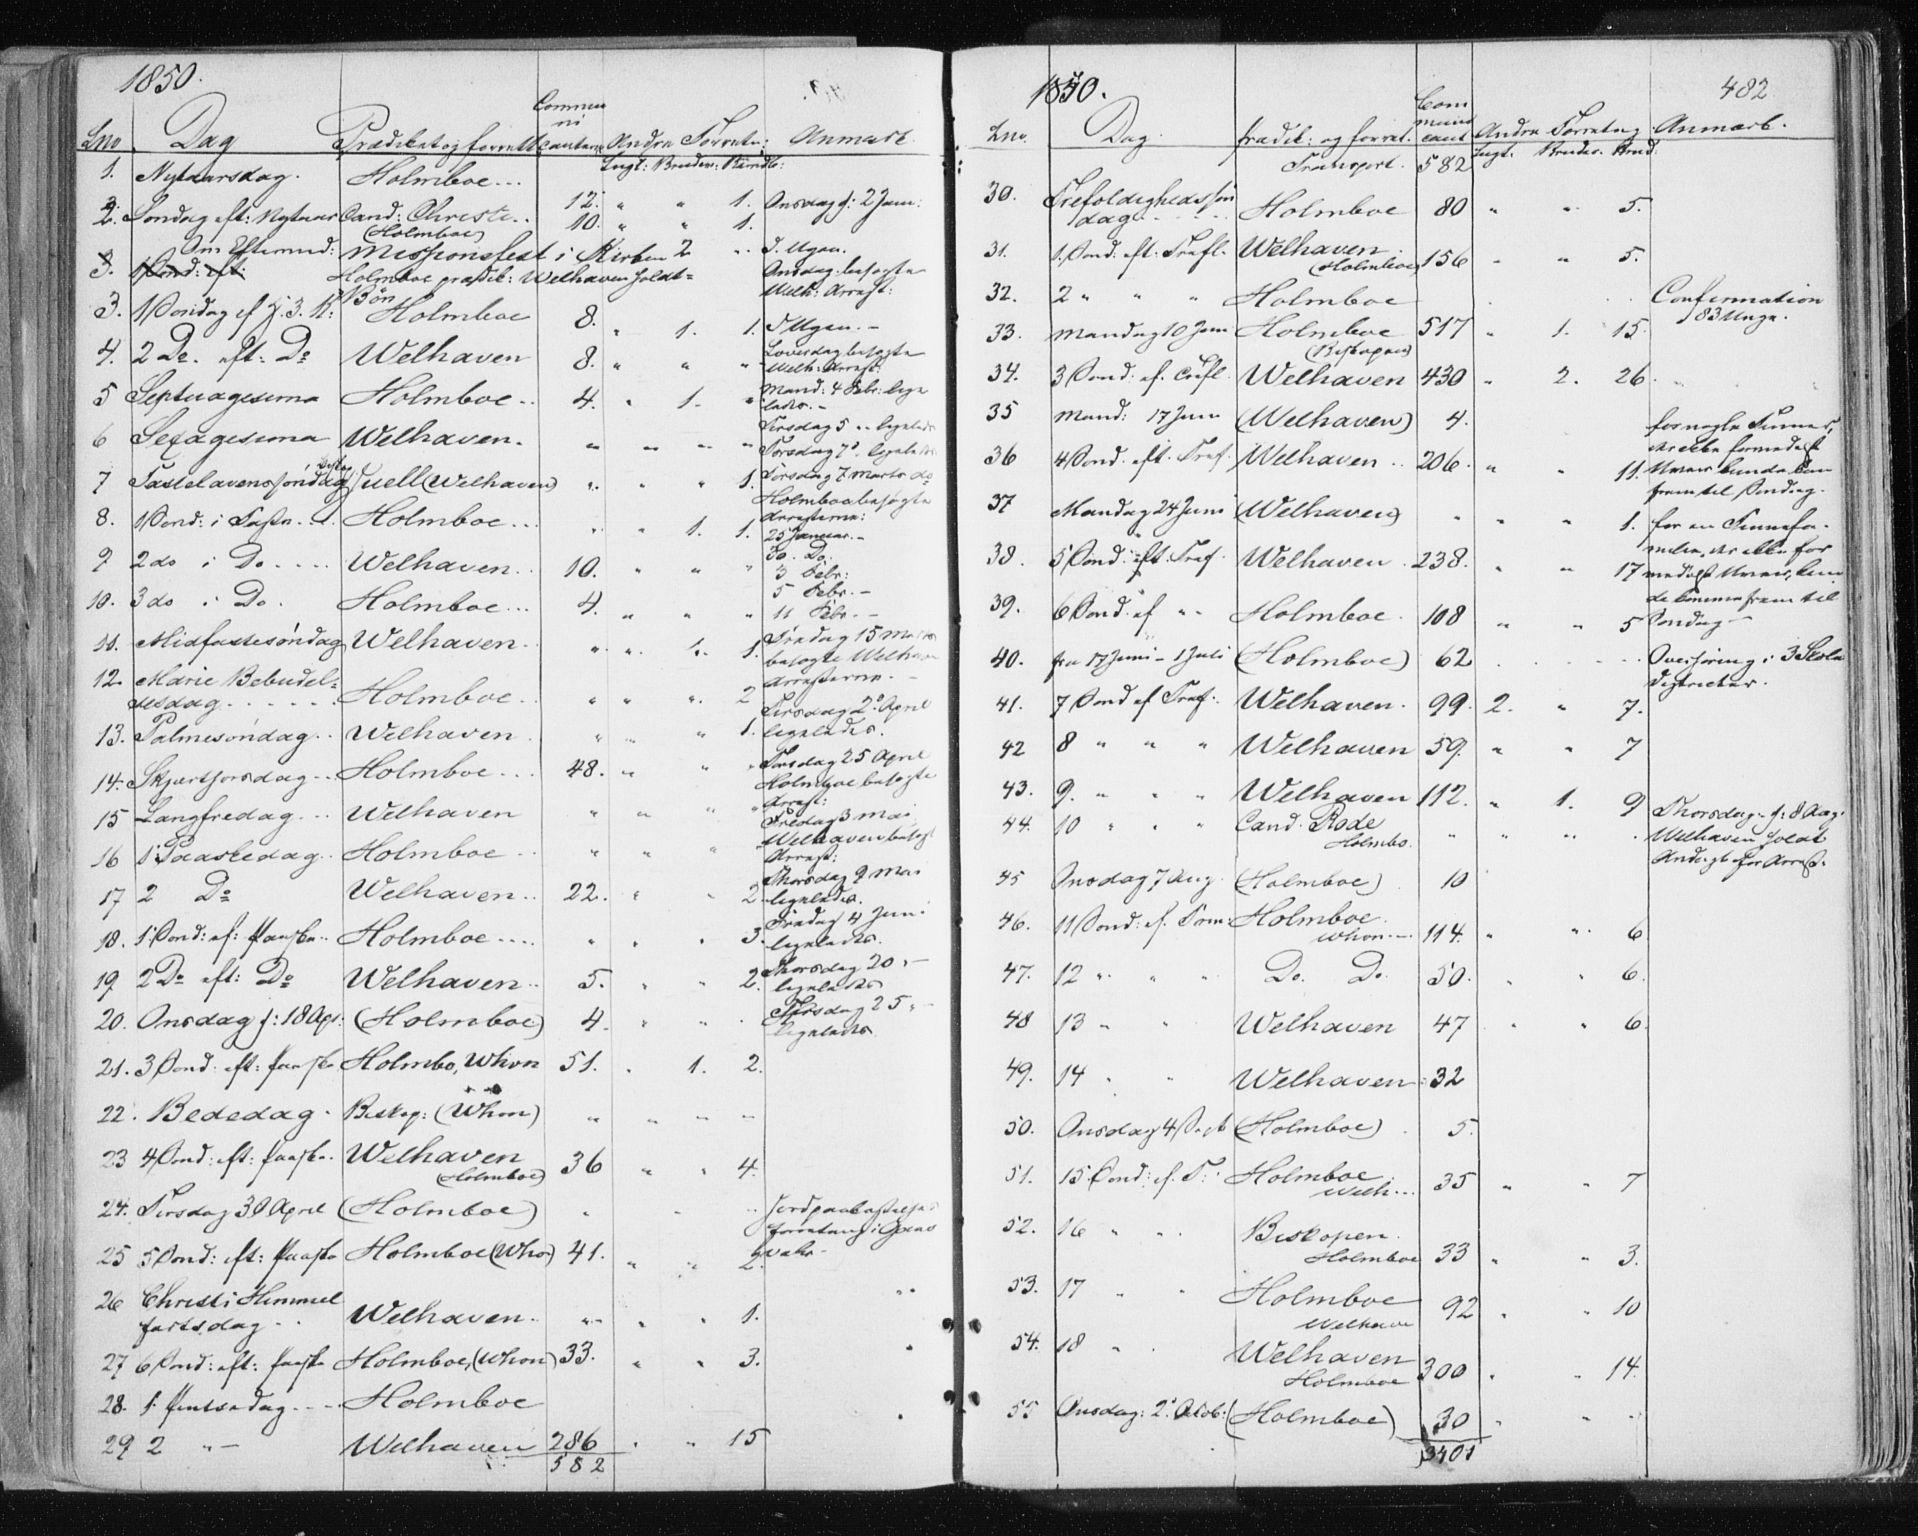 SATØ, Tromsø sokneprestkontor/stiftsprosti/domprosti, G/Ga/L0010kirke: Parish register (official) no. 10, 1848-1855, p. 482